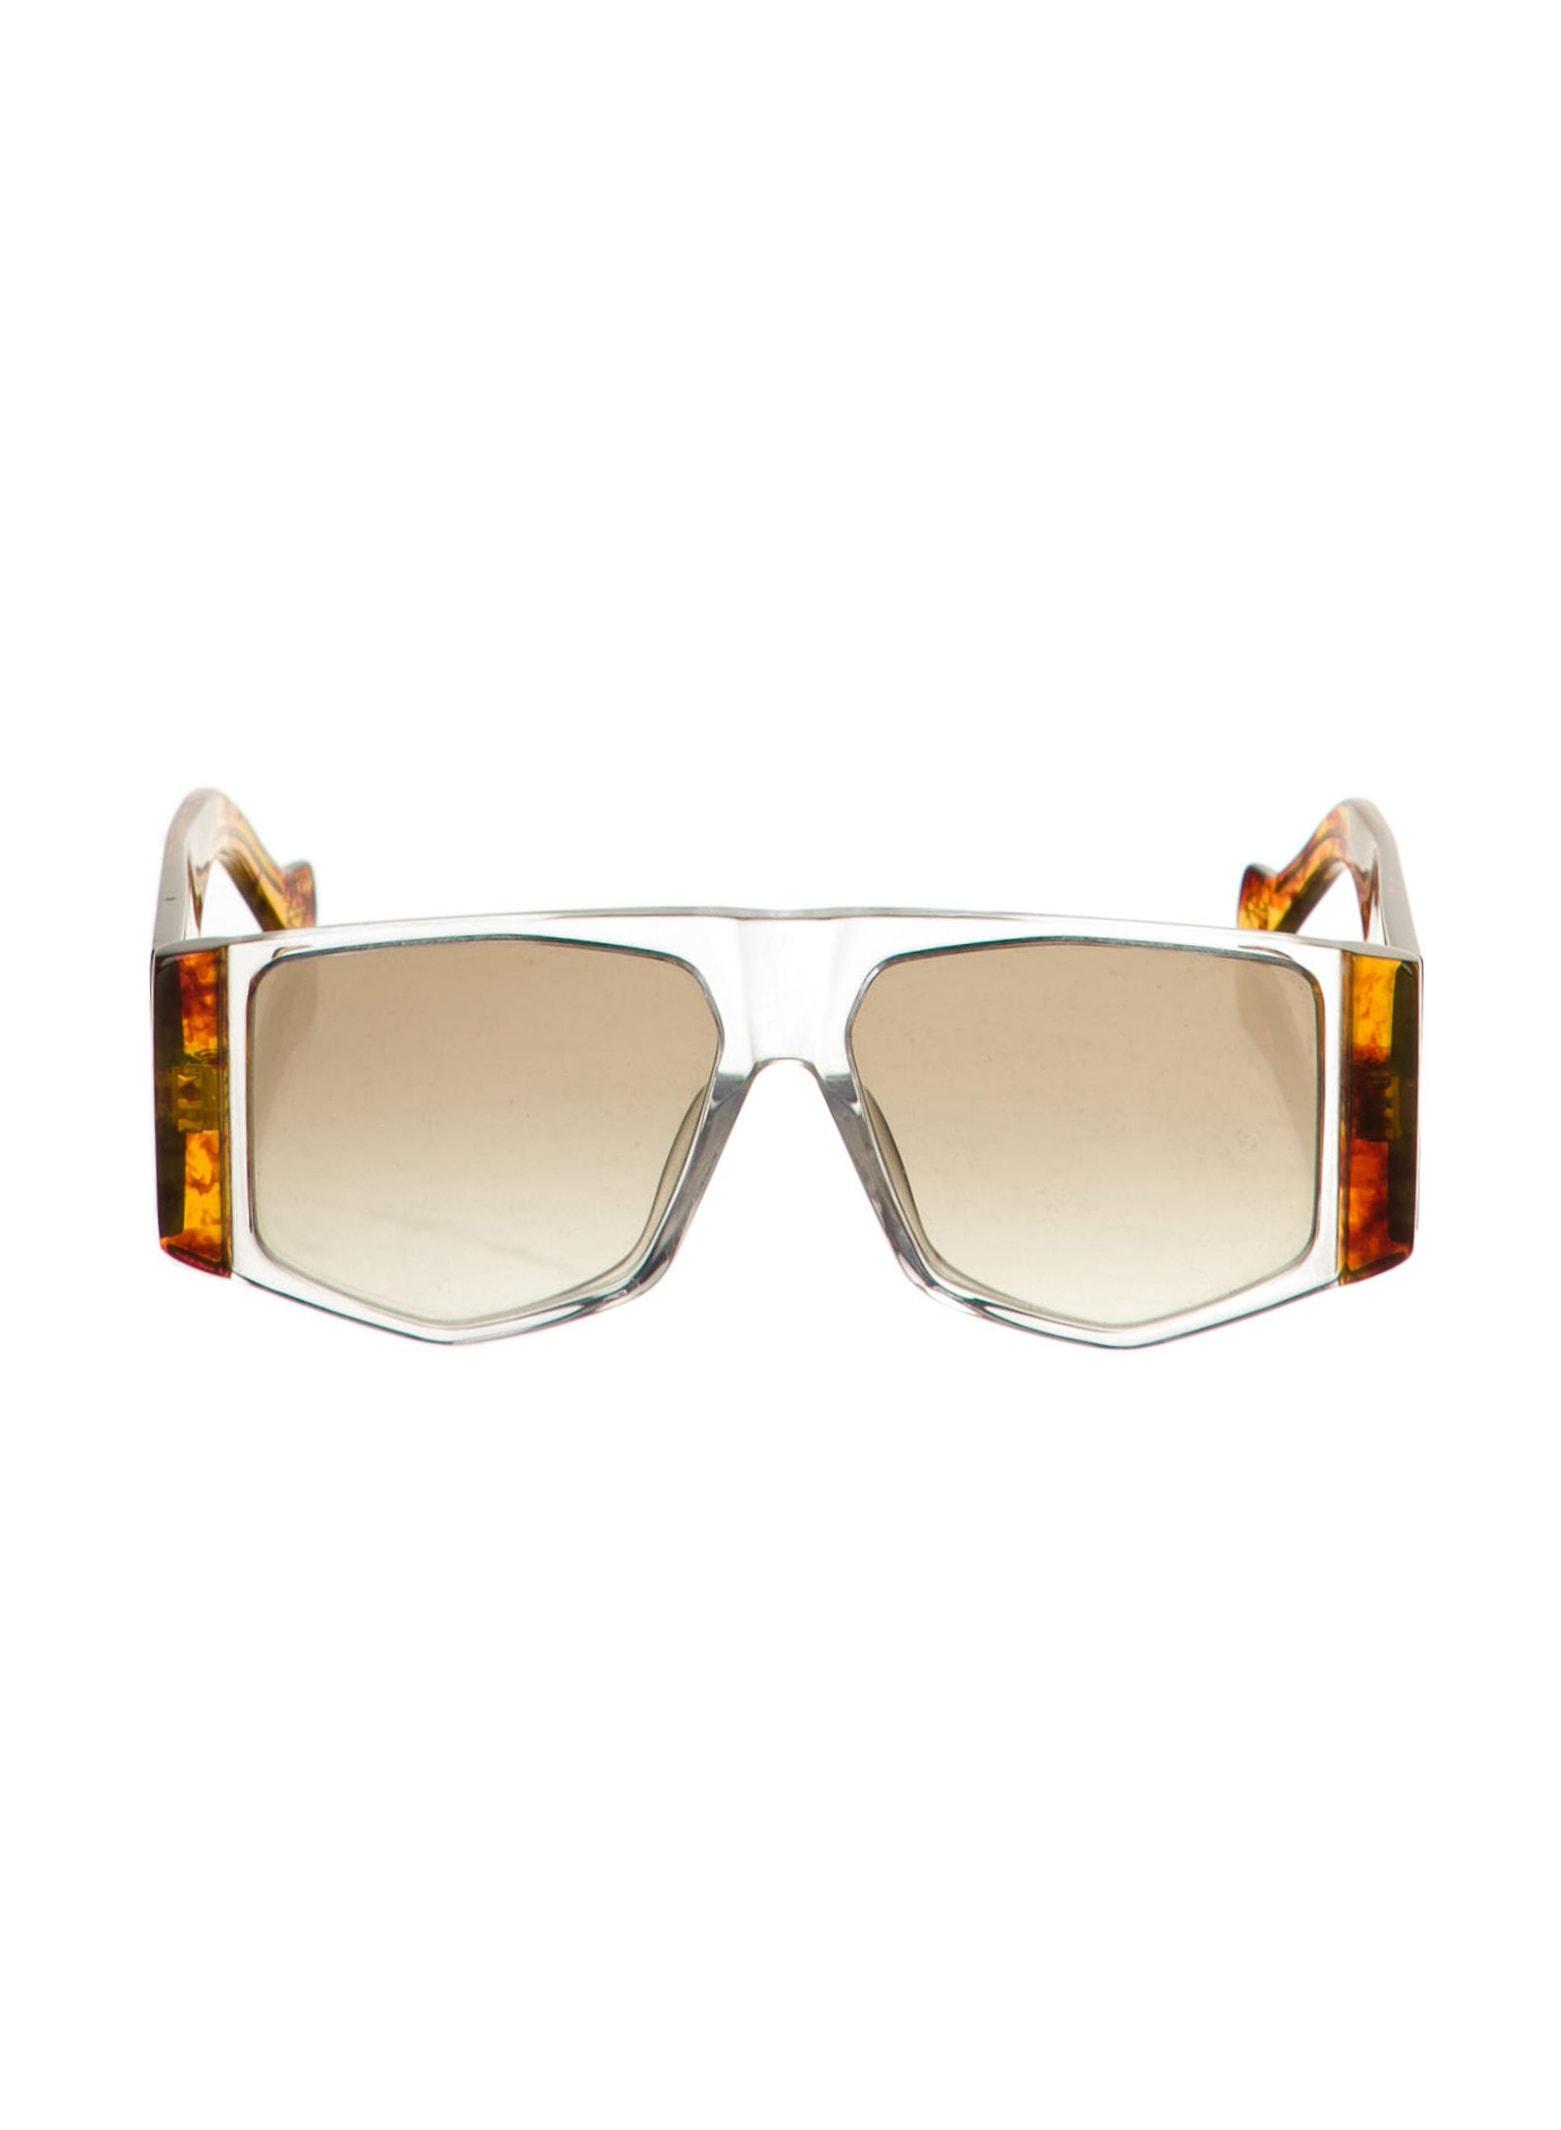 LOEWE Oversize Tinted Sunglasses